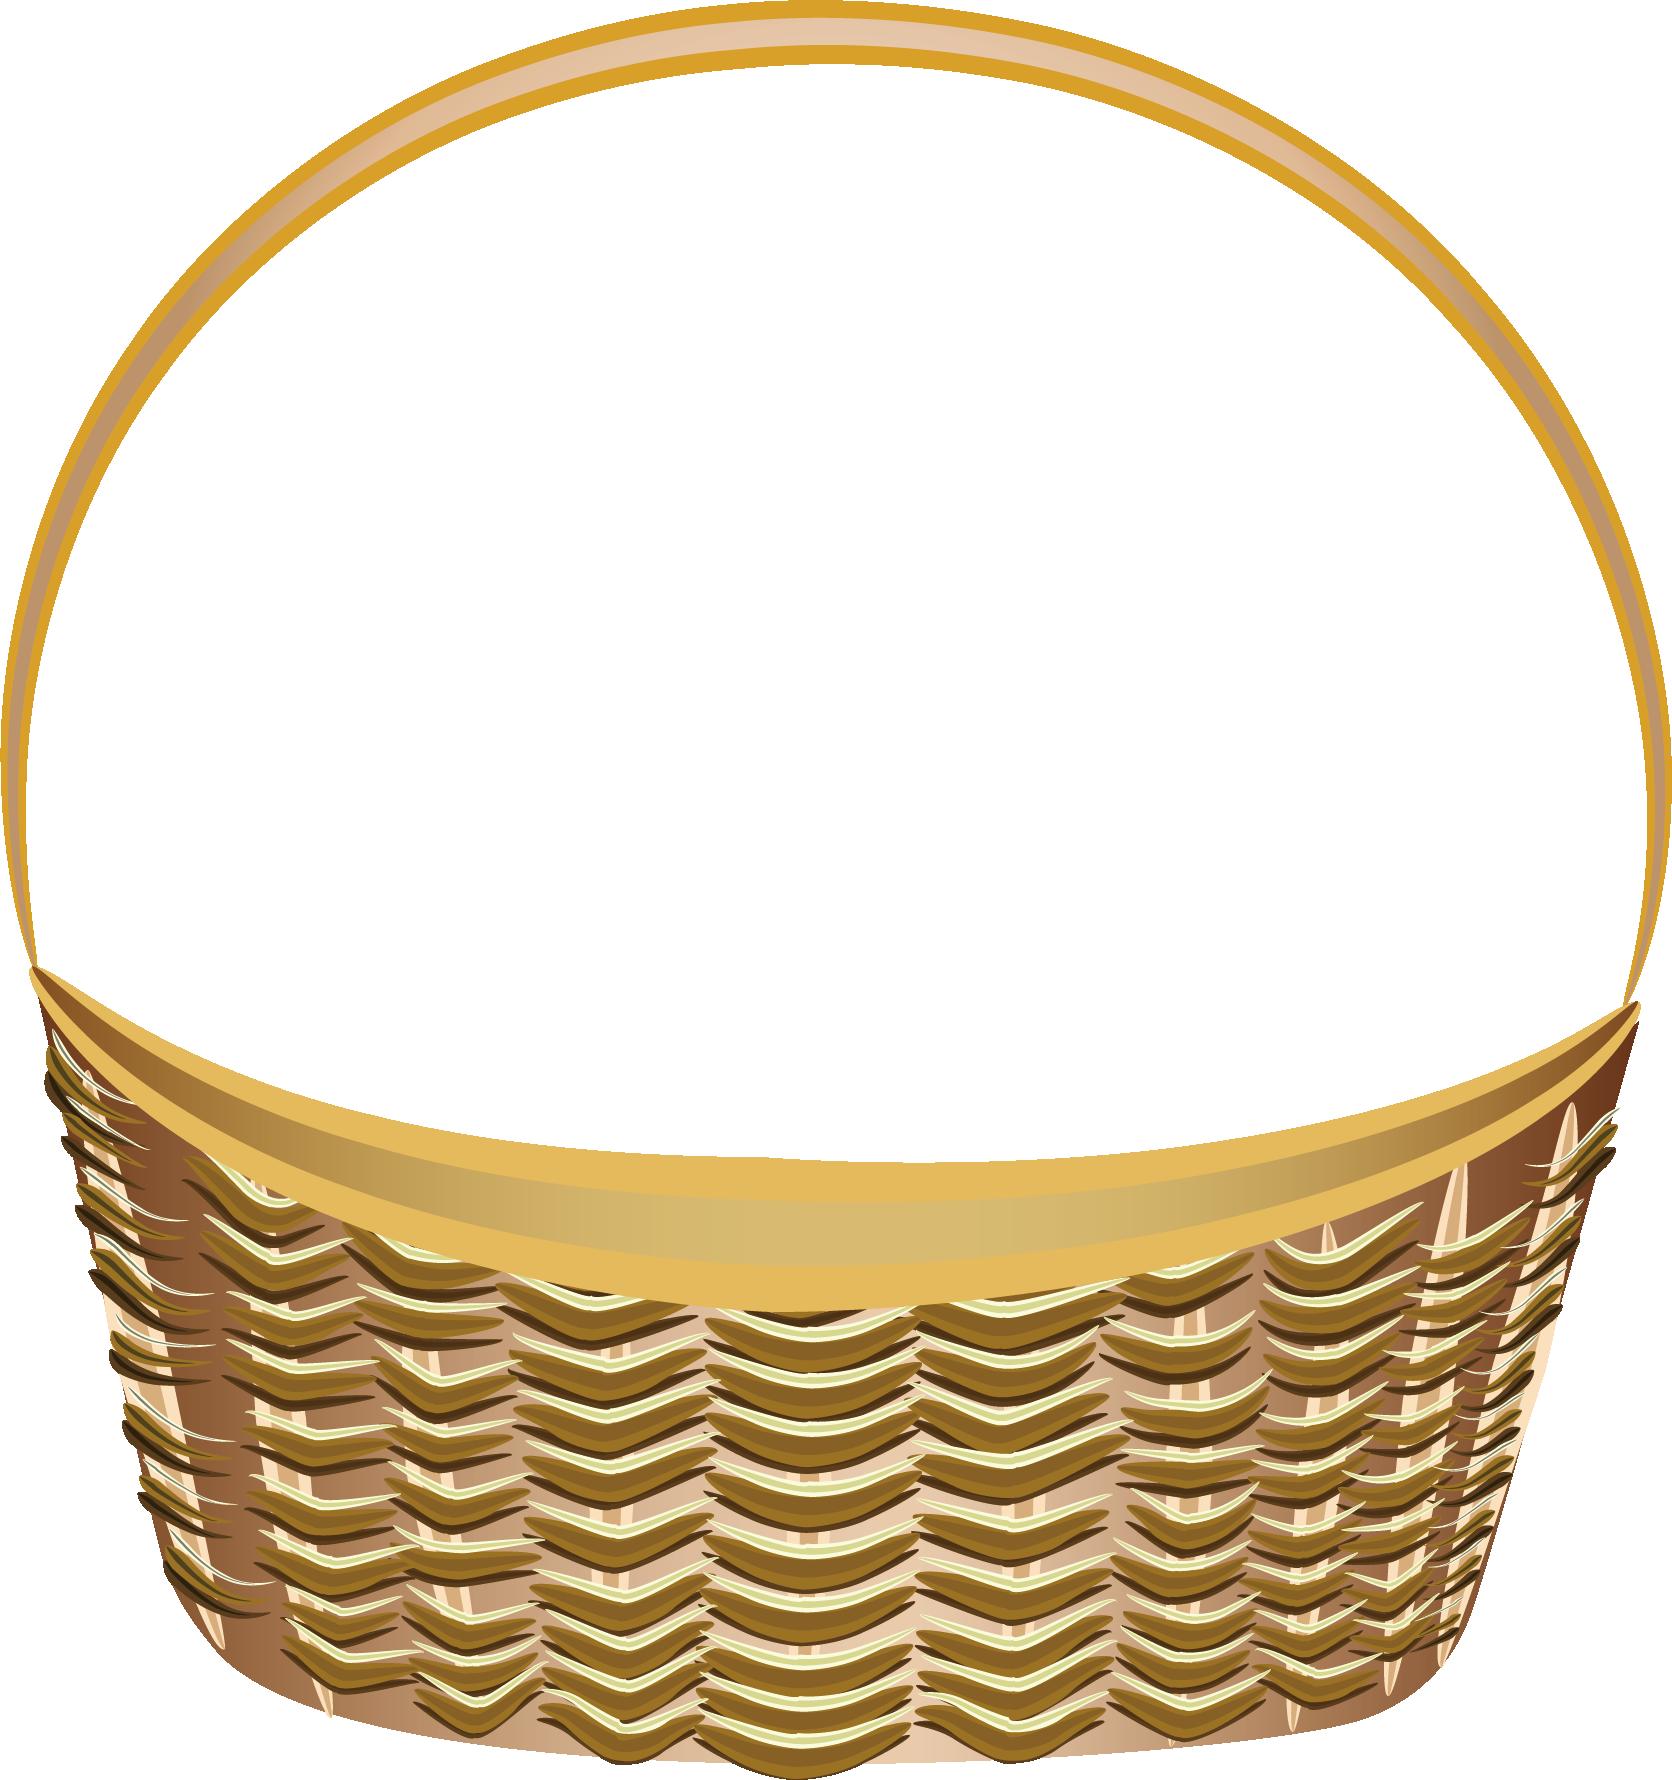 Vegetable fruit clip art. Pear clipart basket